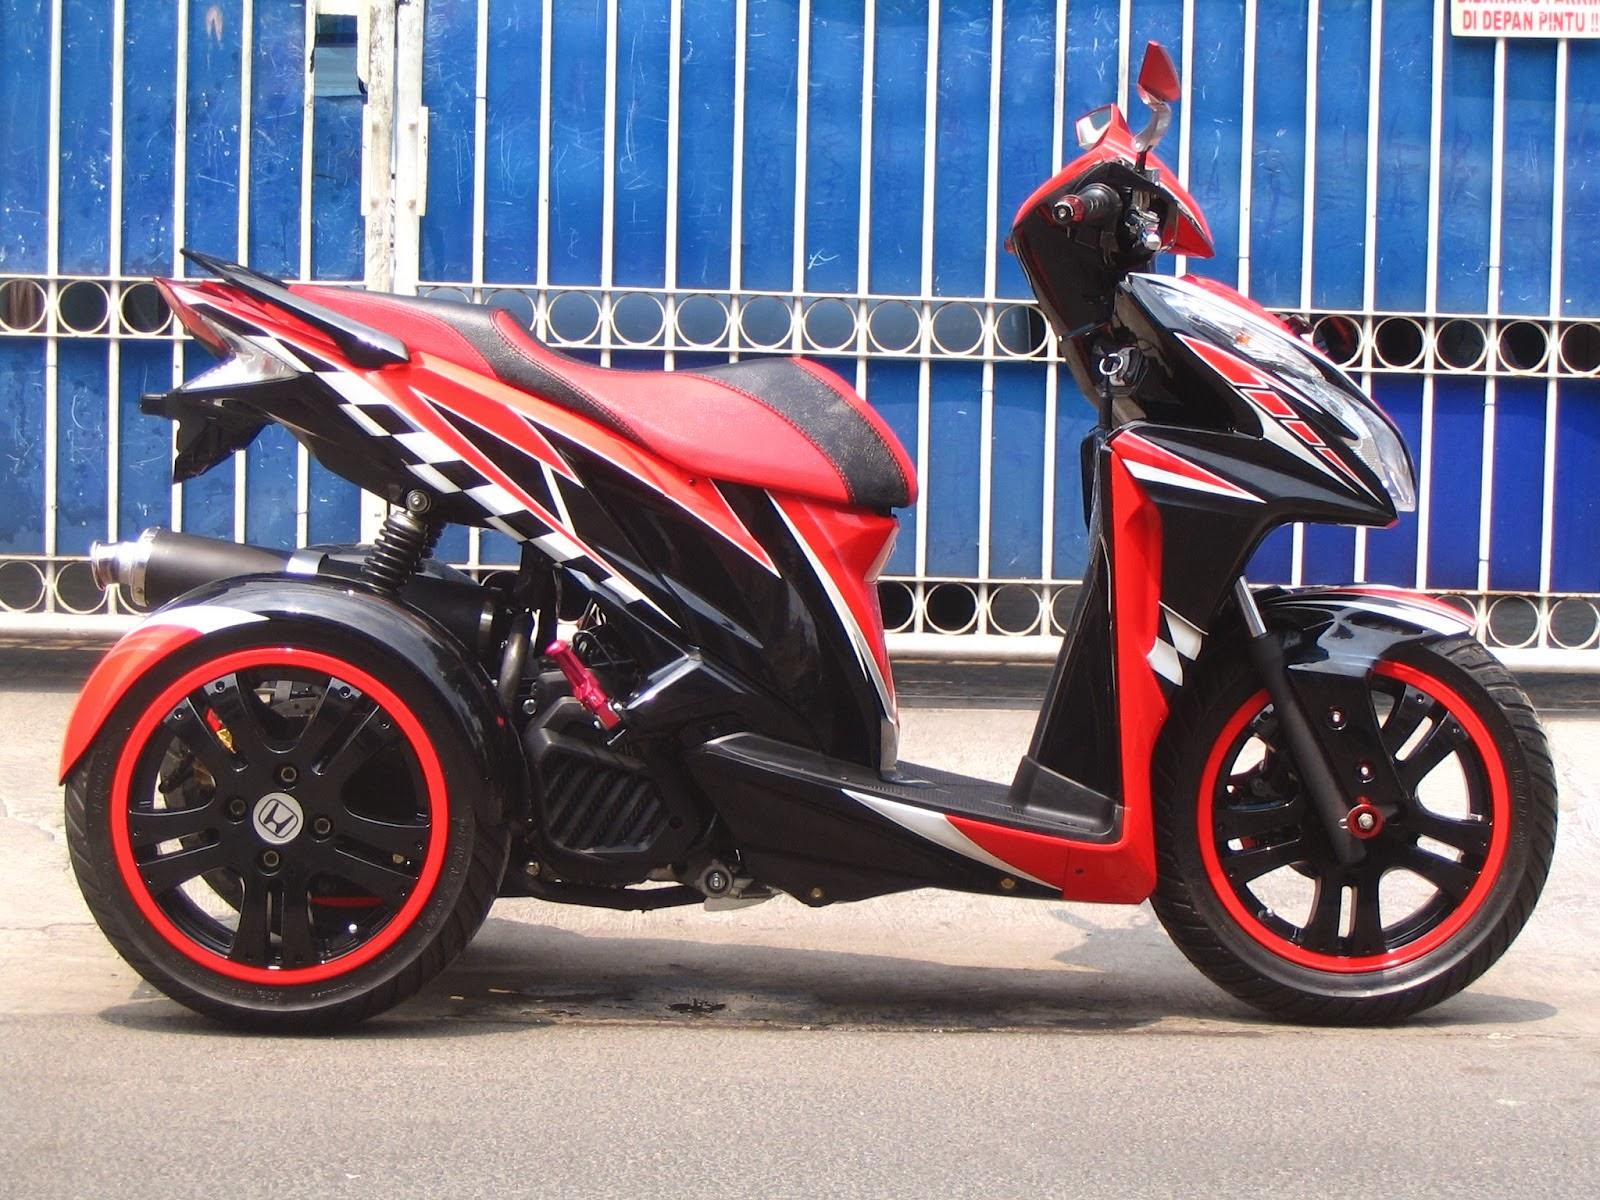 5 Variasi Motor Honda Vario Techno 125  Variasi Motor